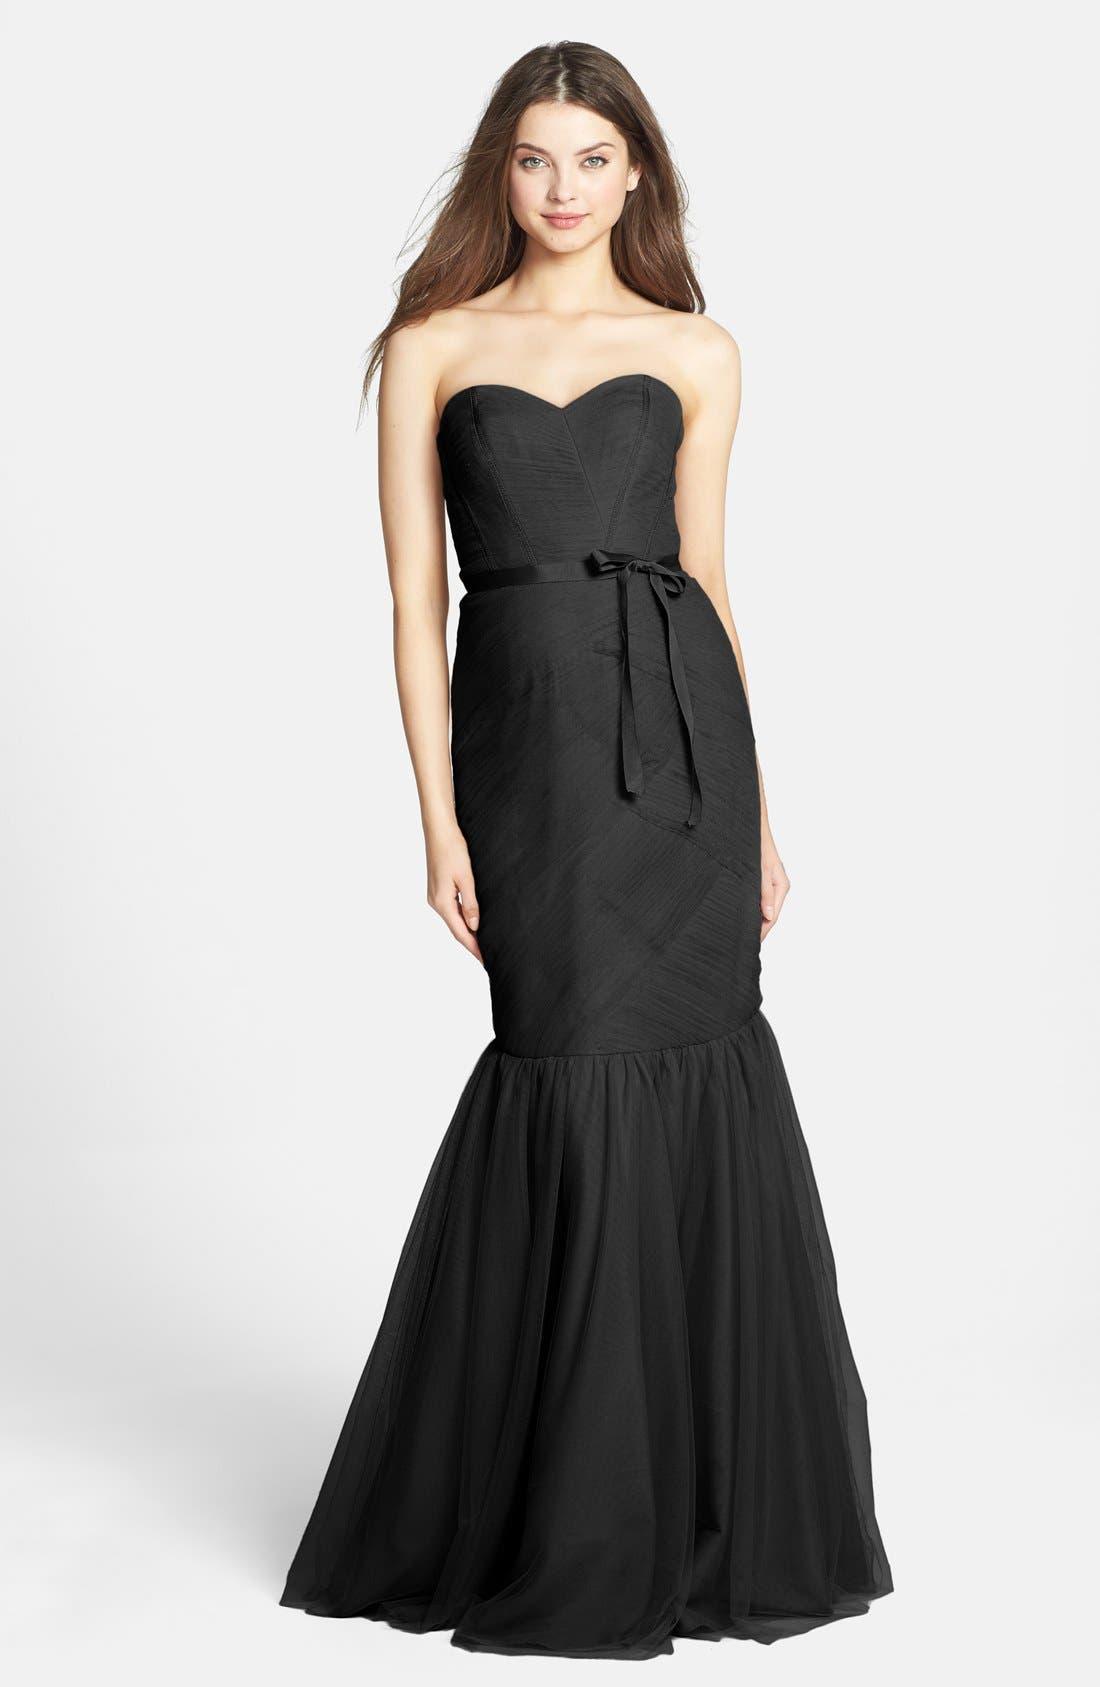 Alternate Image 1 Selected - Monique Lhuillier Bridesmaids Strapless Tulle Trumpet Dress